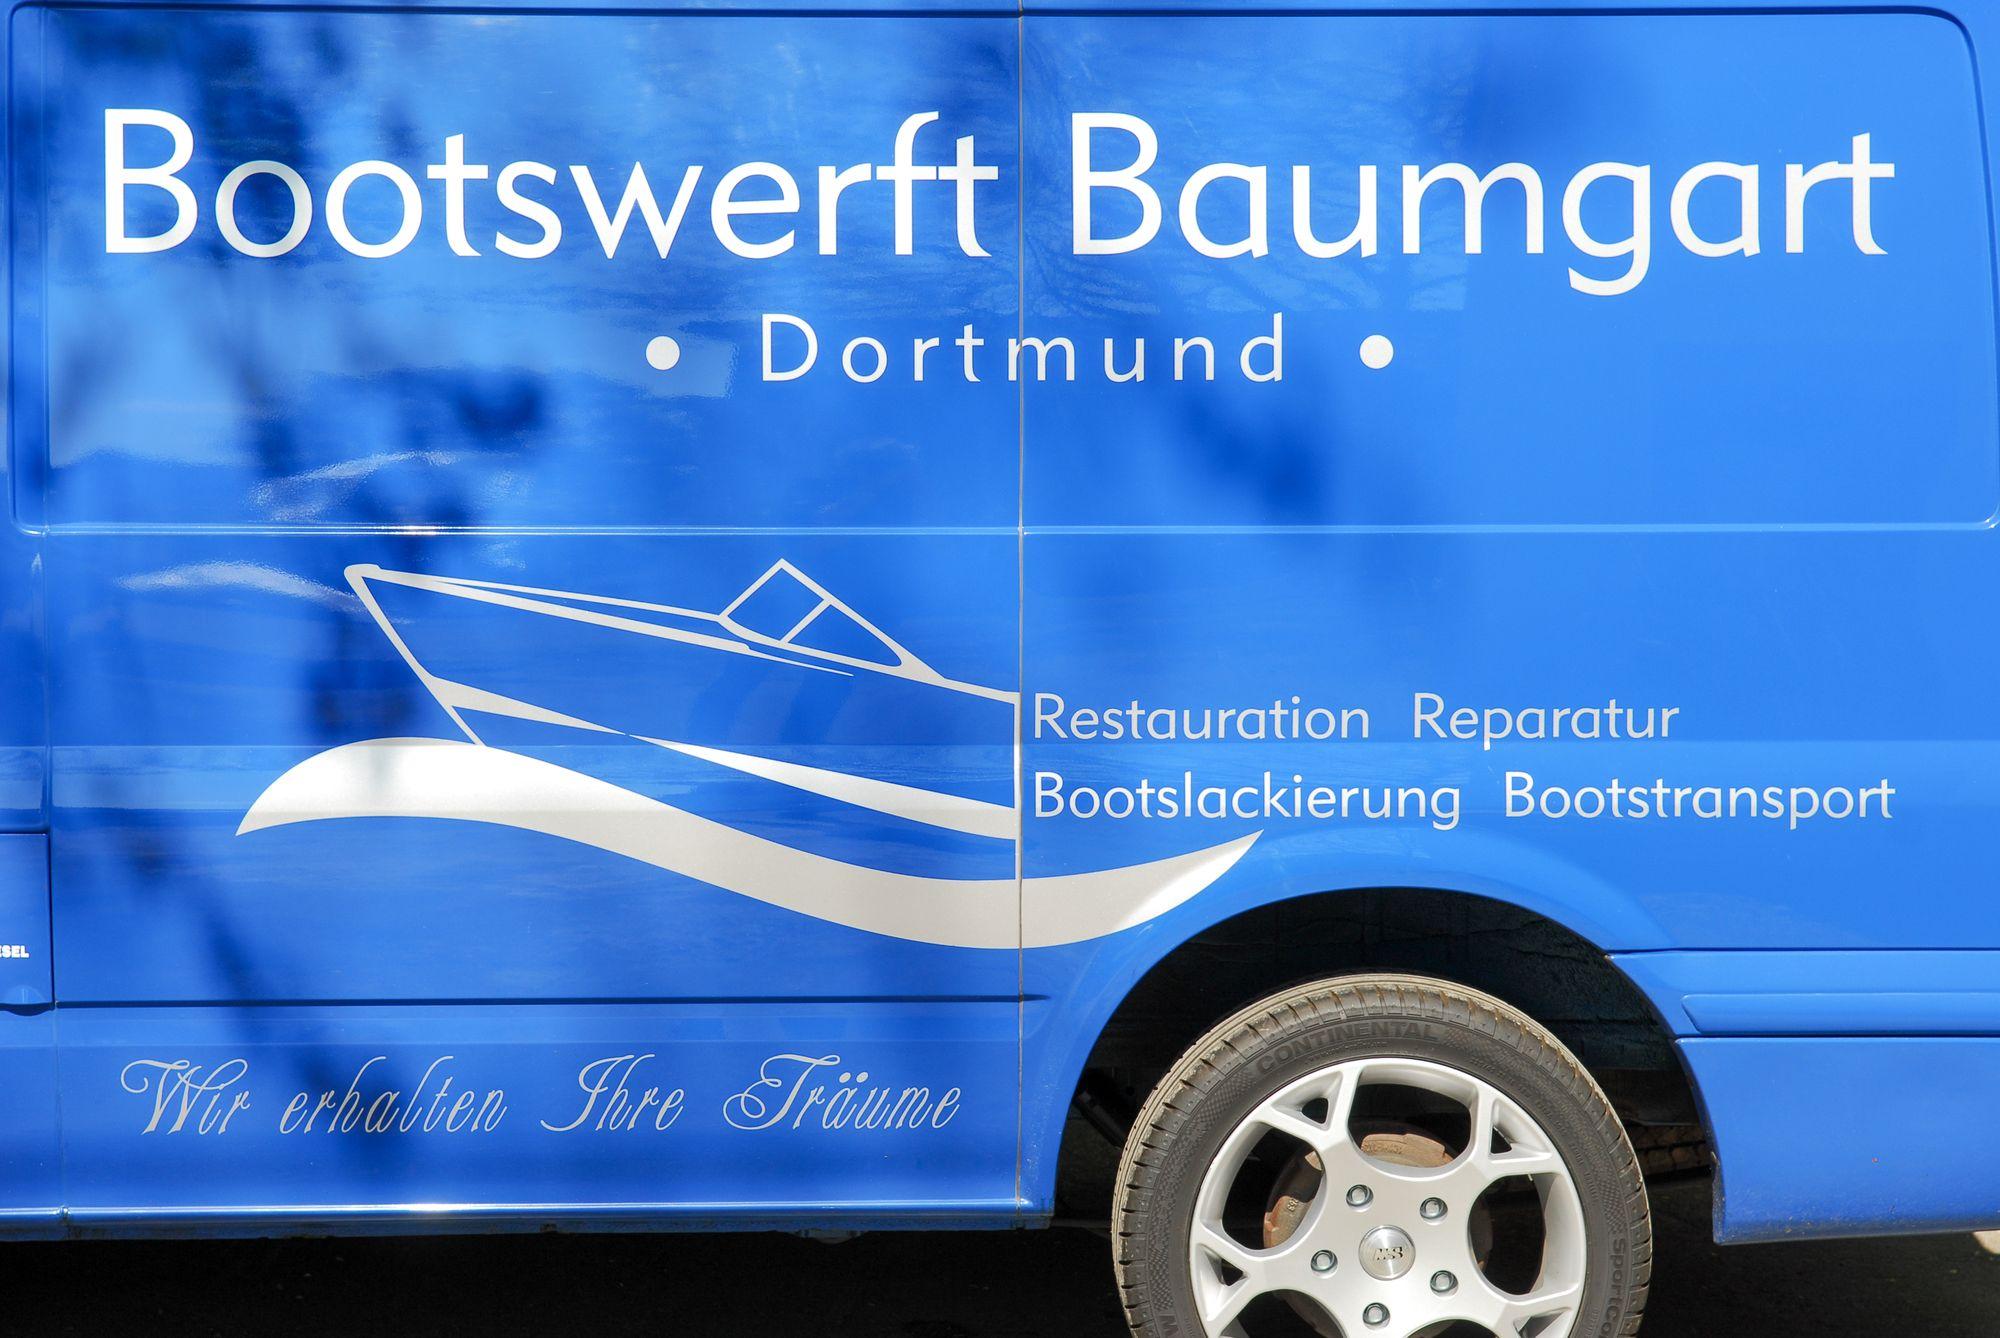 Bootswerft Baumgart Dortmund